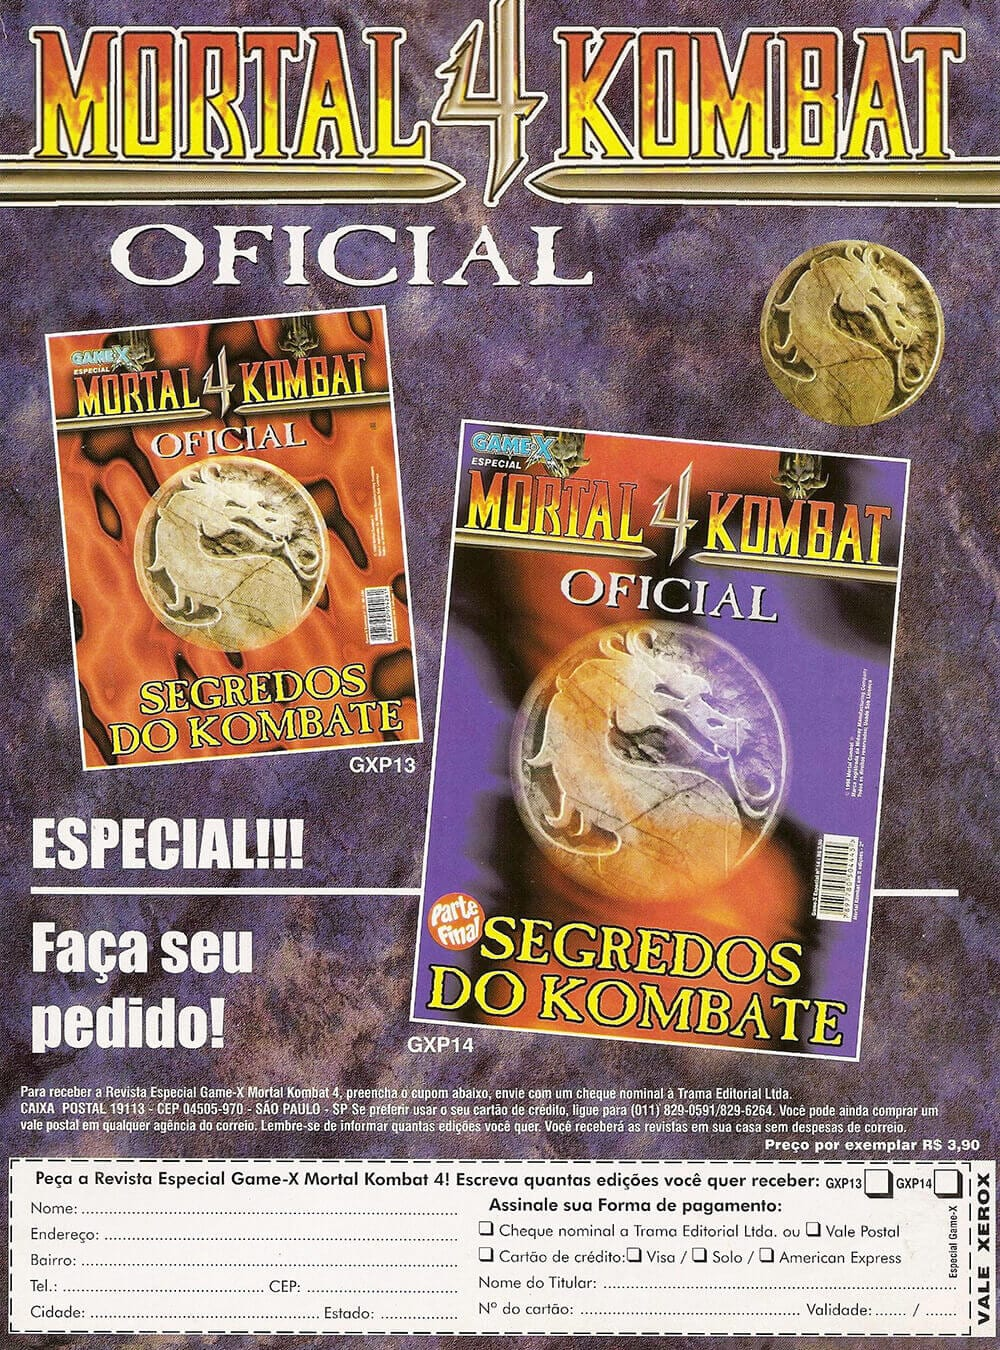 Propaganda Mortal Kombat 4 Oficial